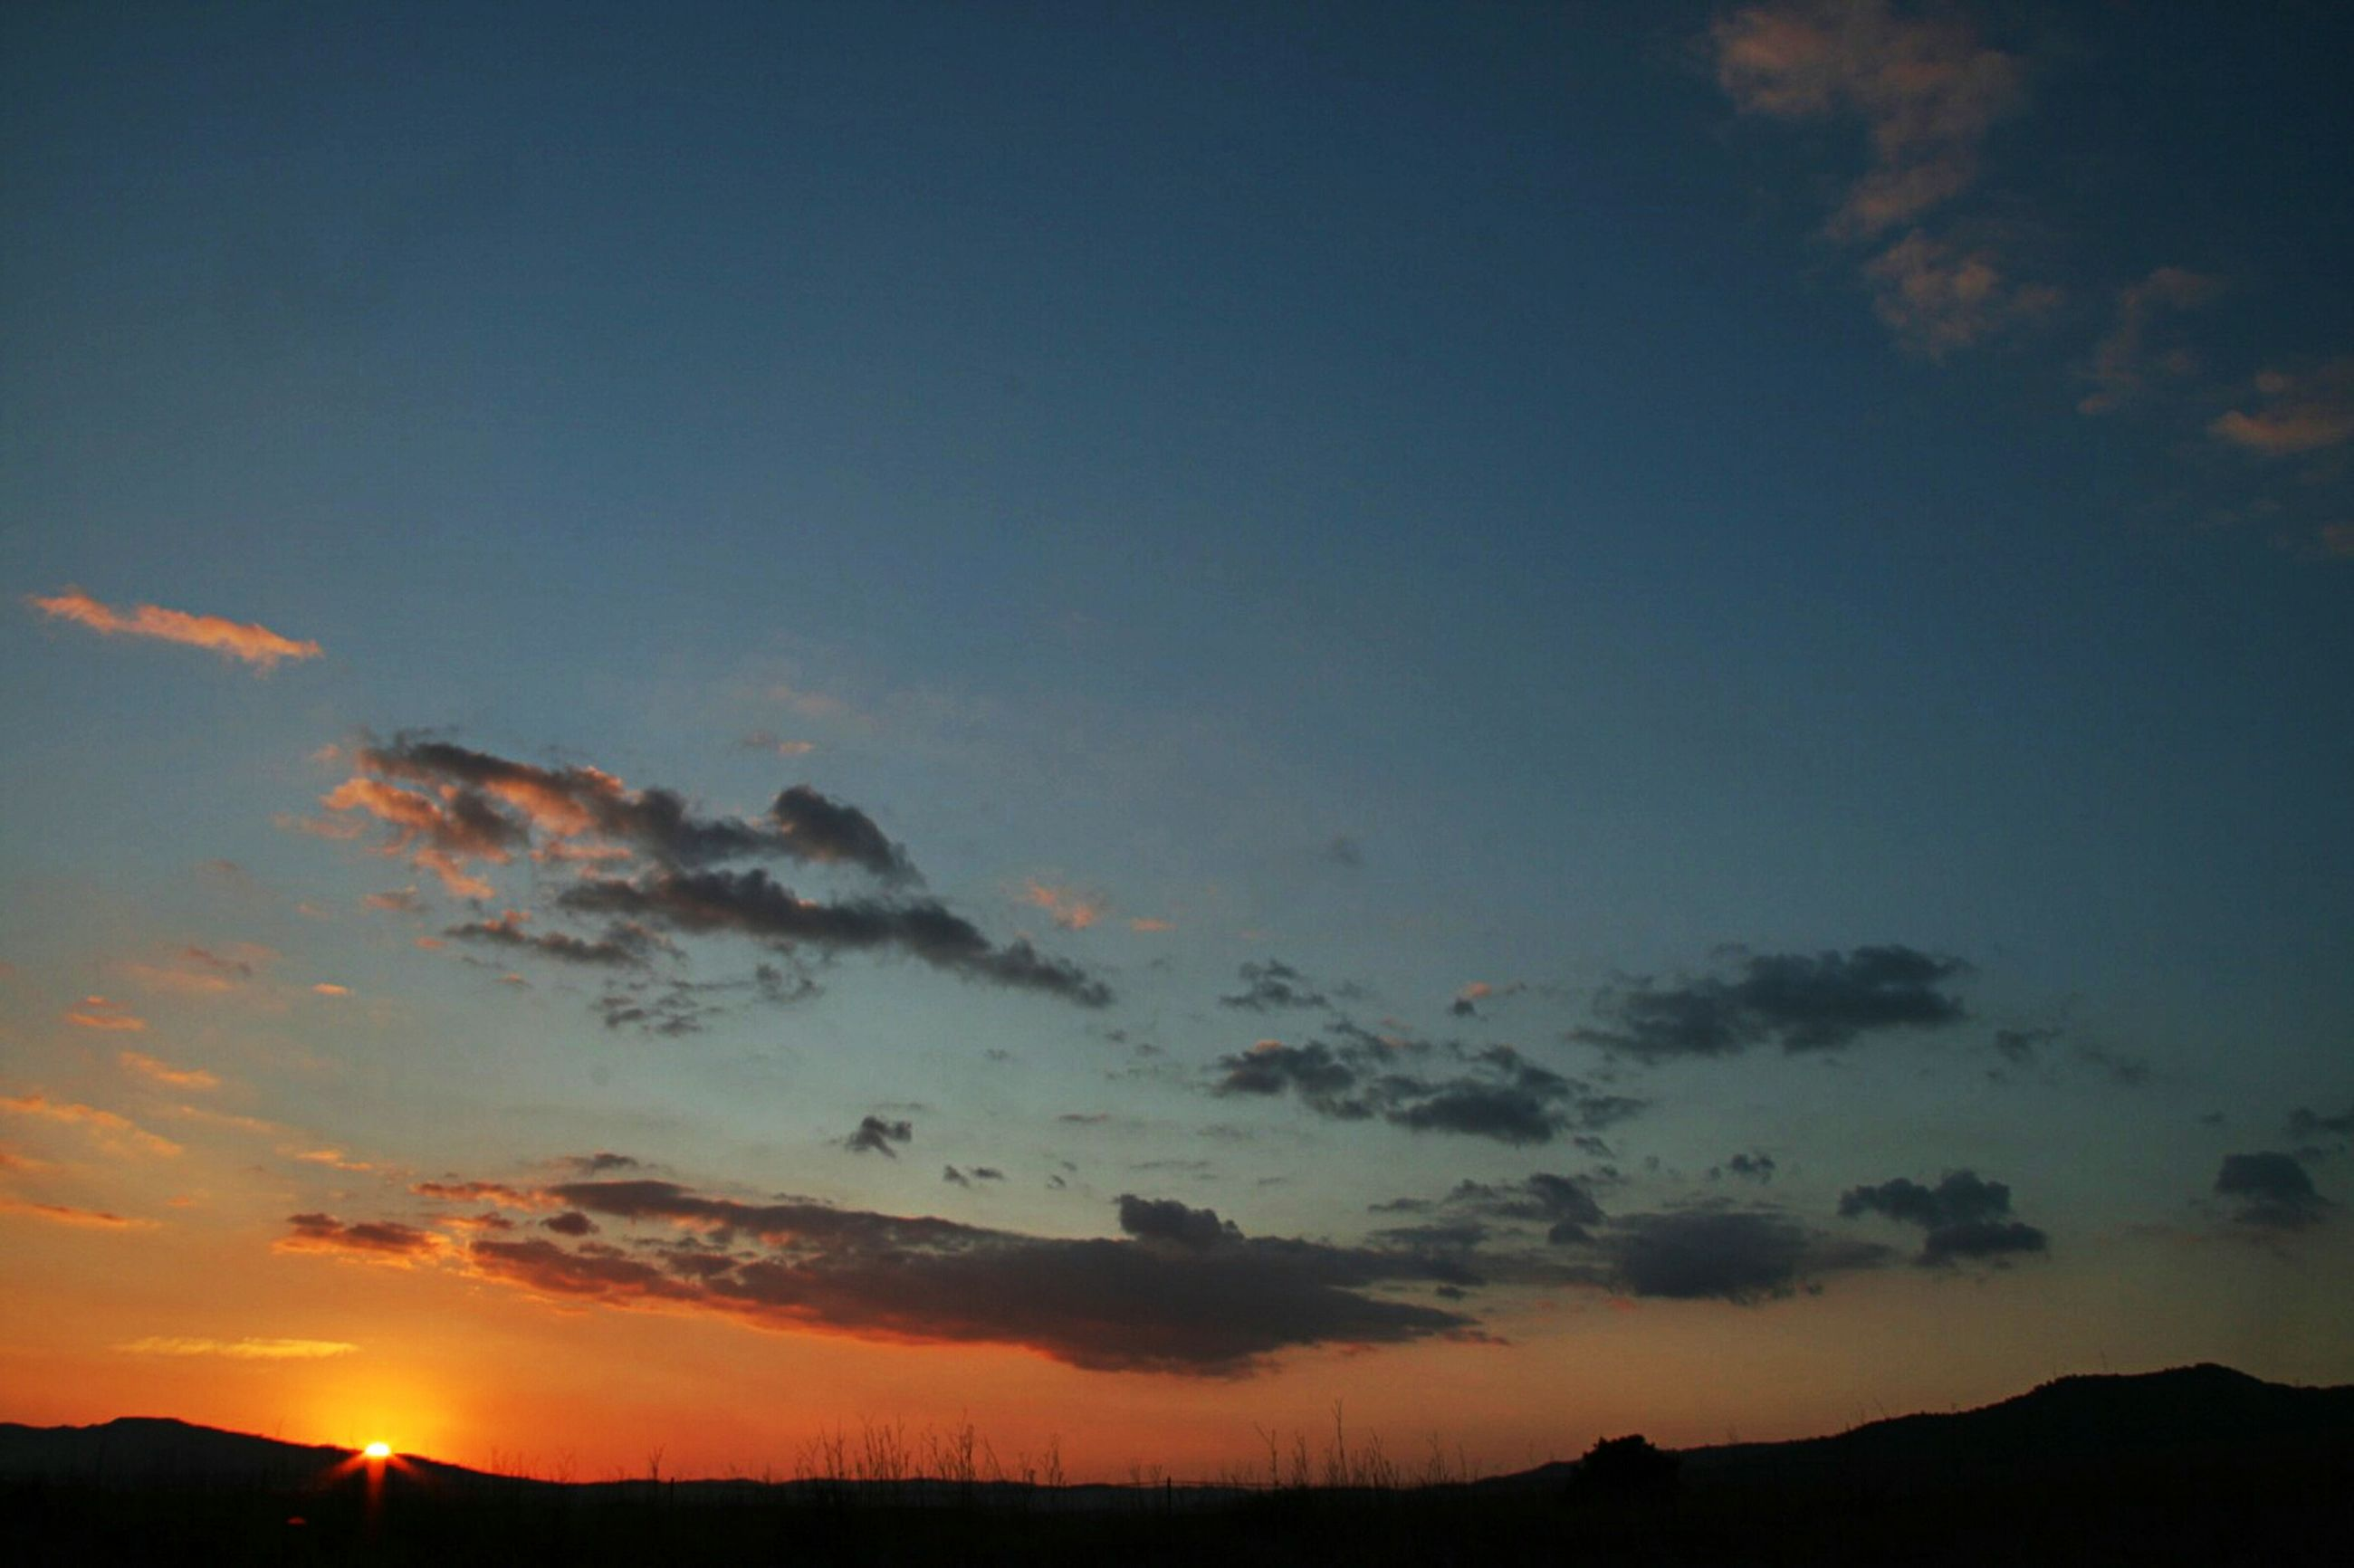 sunset, silhouette, scenics, tranquil scene, tranquility, beauty in nature, sky, mountain, landscape, orange color, sun, nature, idyllic, cloud - sky, mountain range, sunlight, outdoors, cloud, majestic, dusk